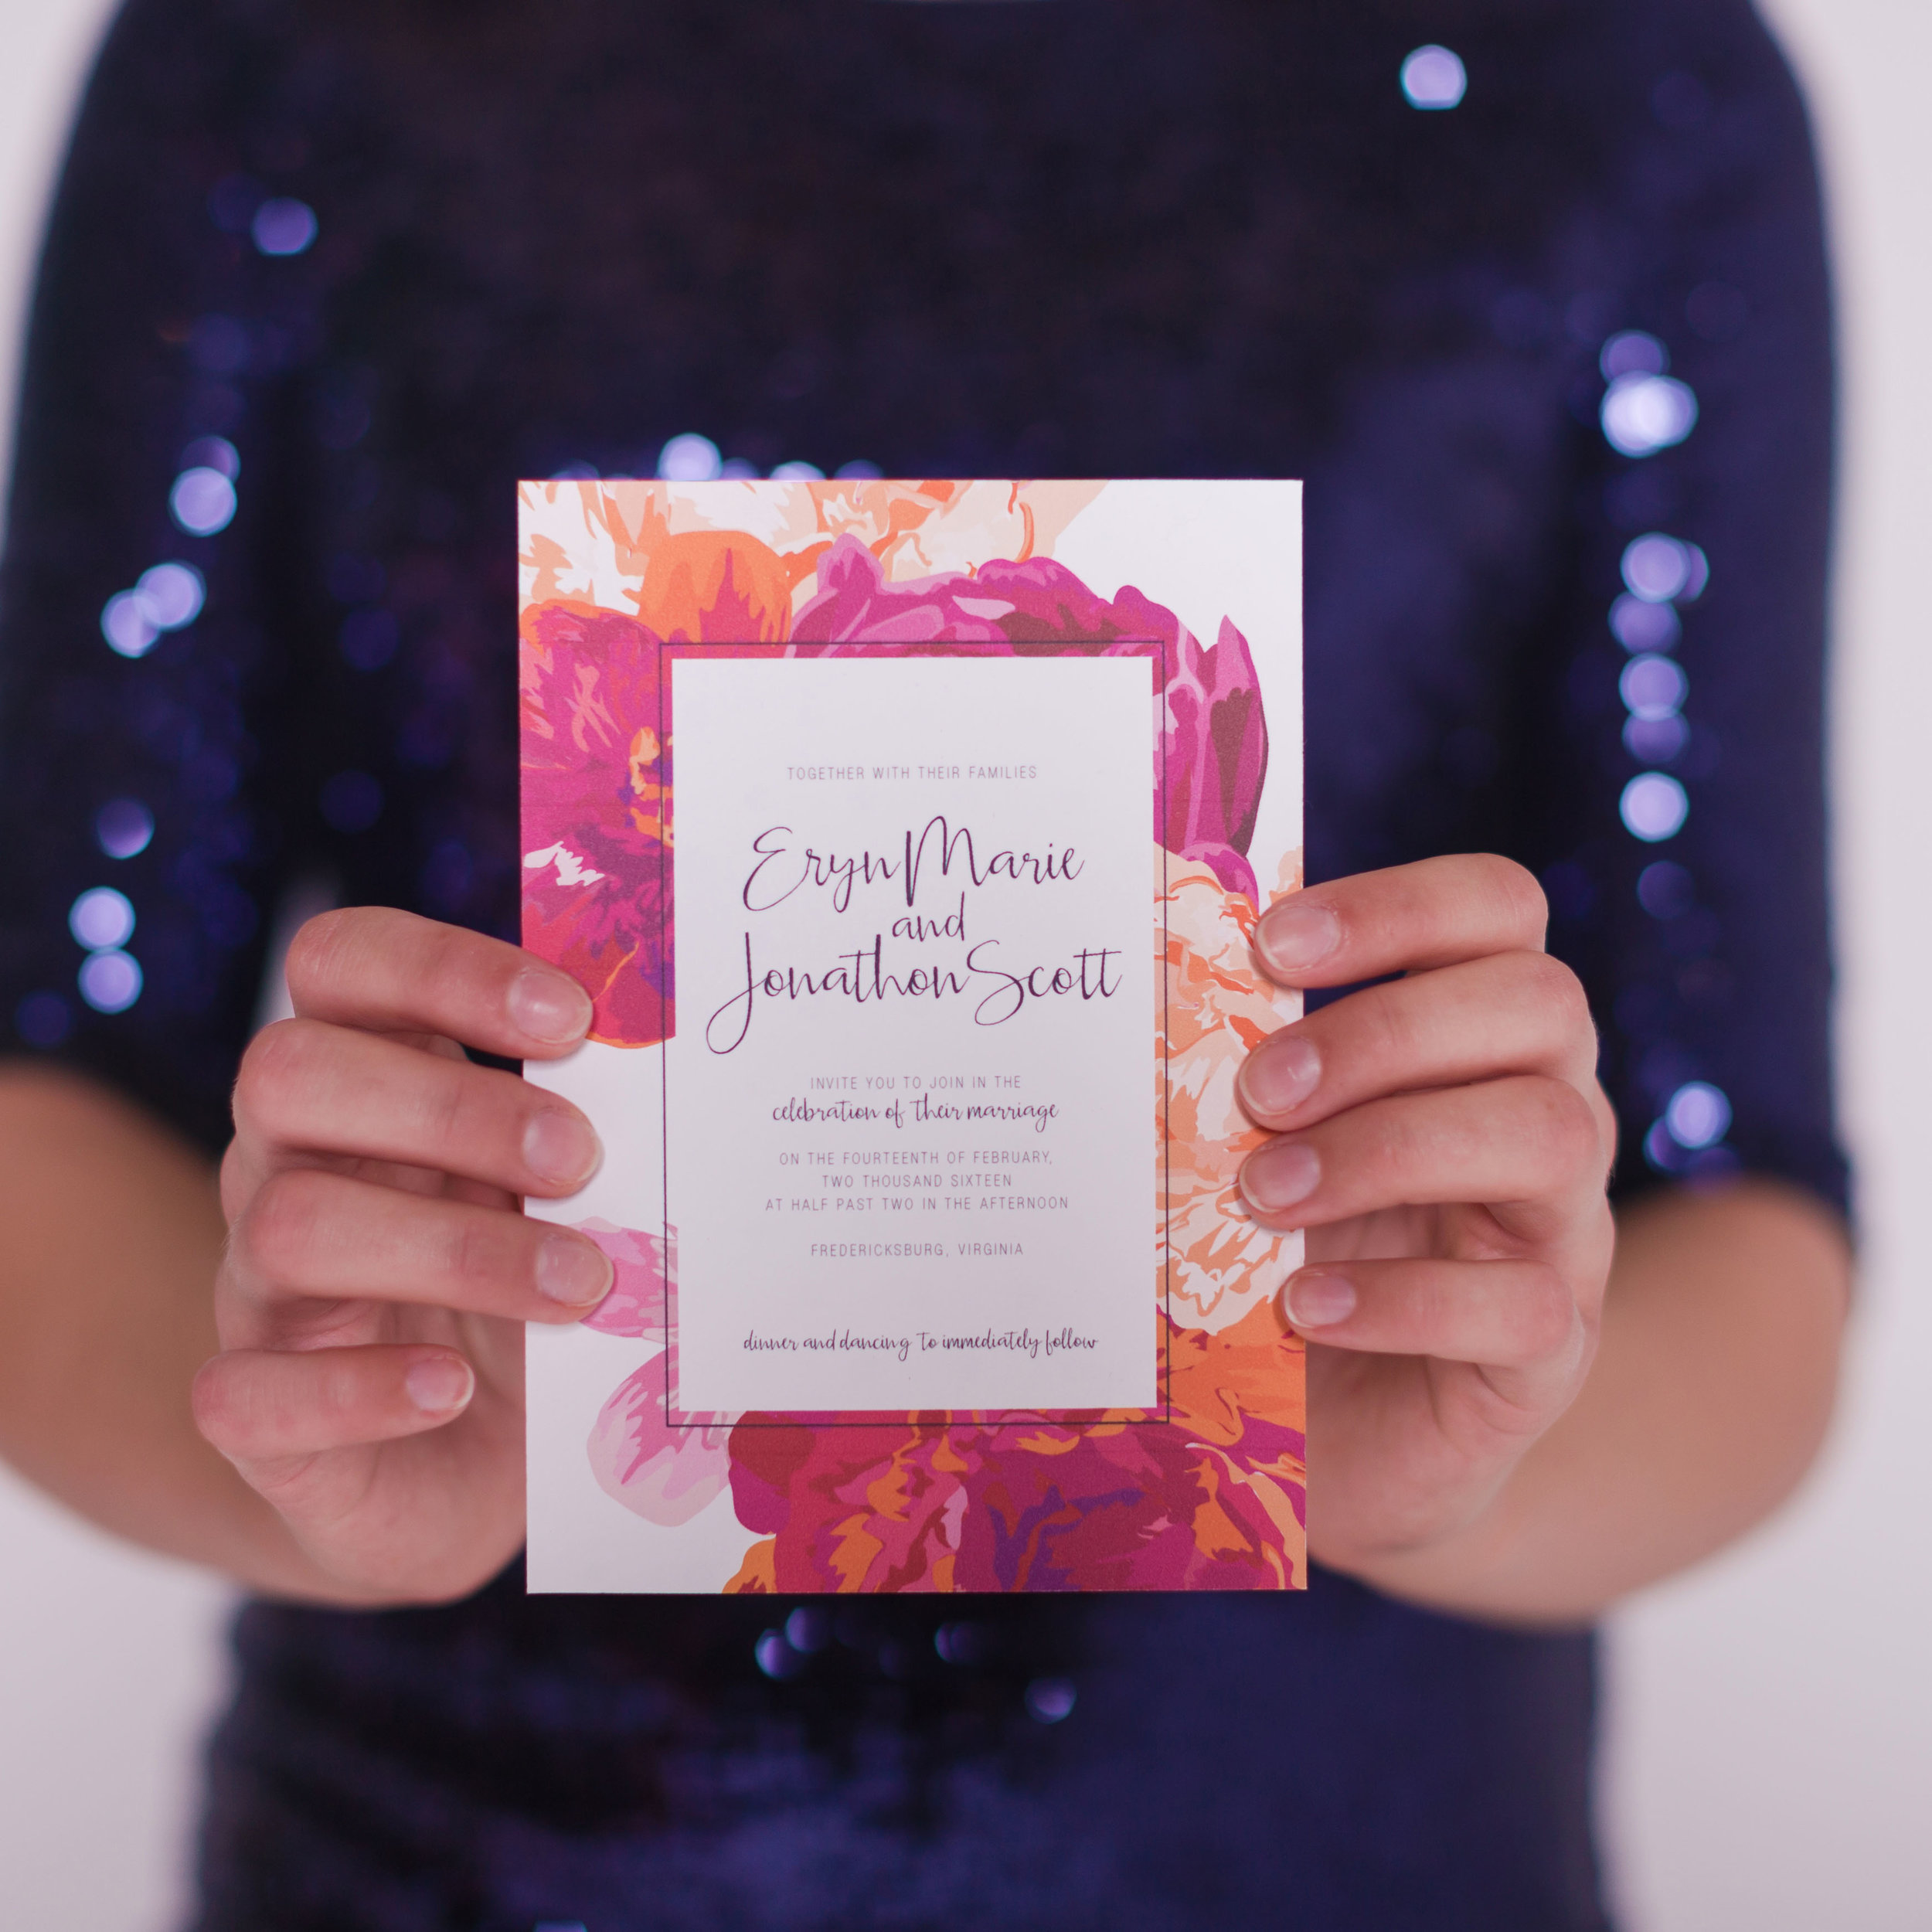 custom gold foil wedding invitations | new jersey wedding invitation designer | princeton invitation designer | elegant and floral wedding invitations | kate spade wedding invitations